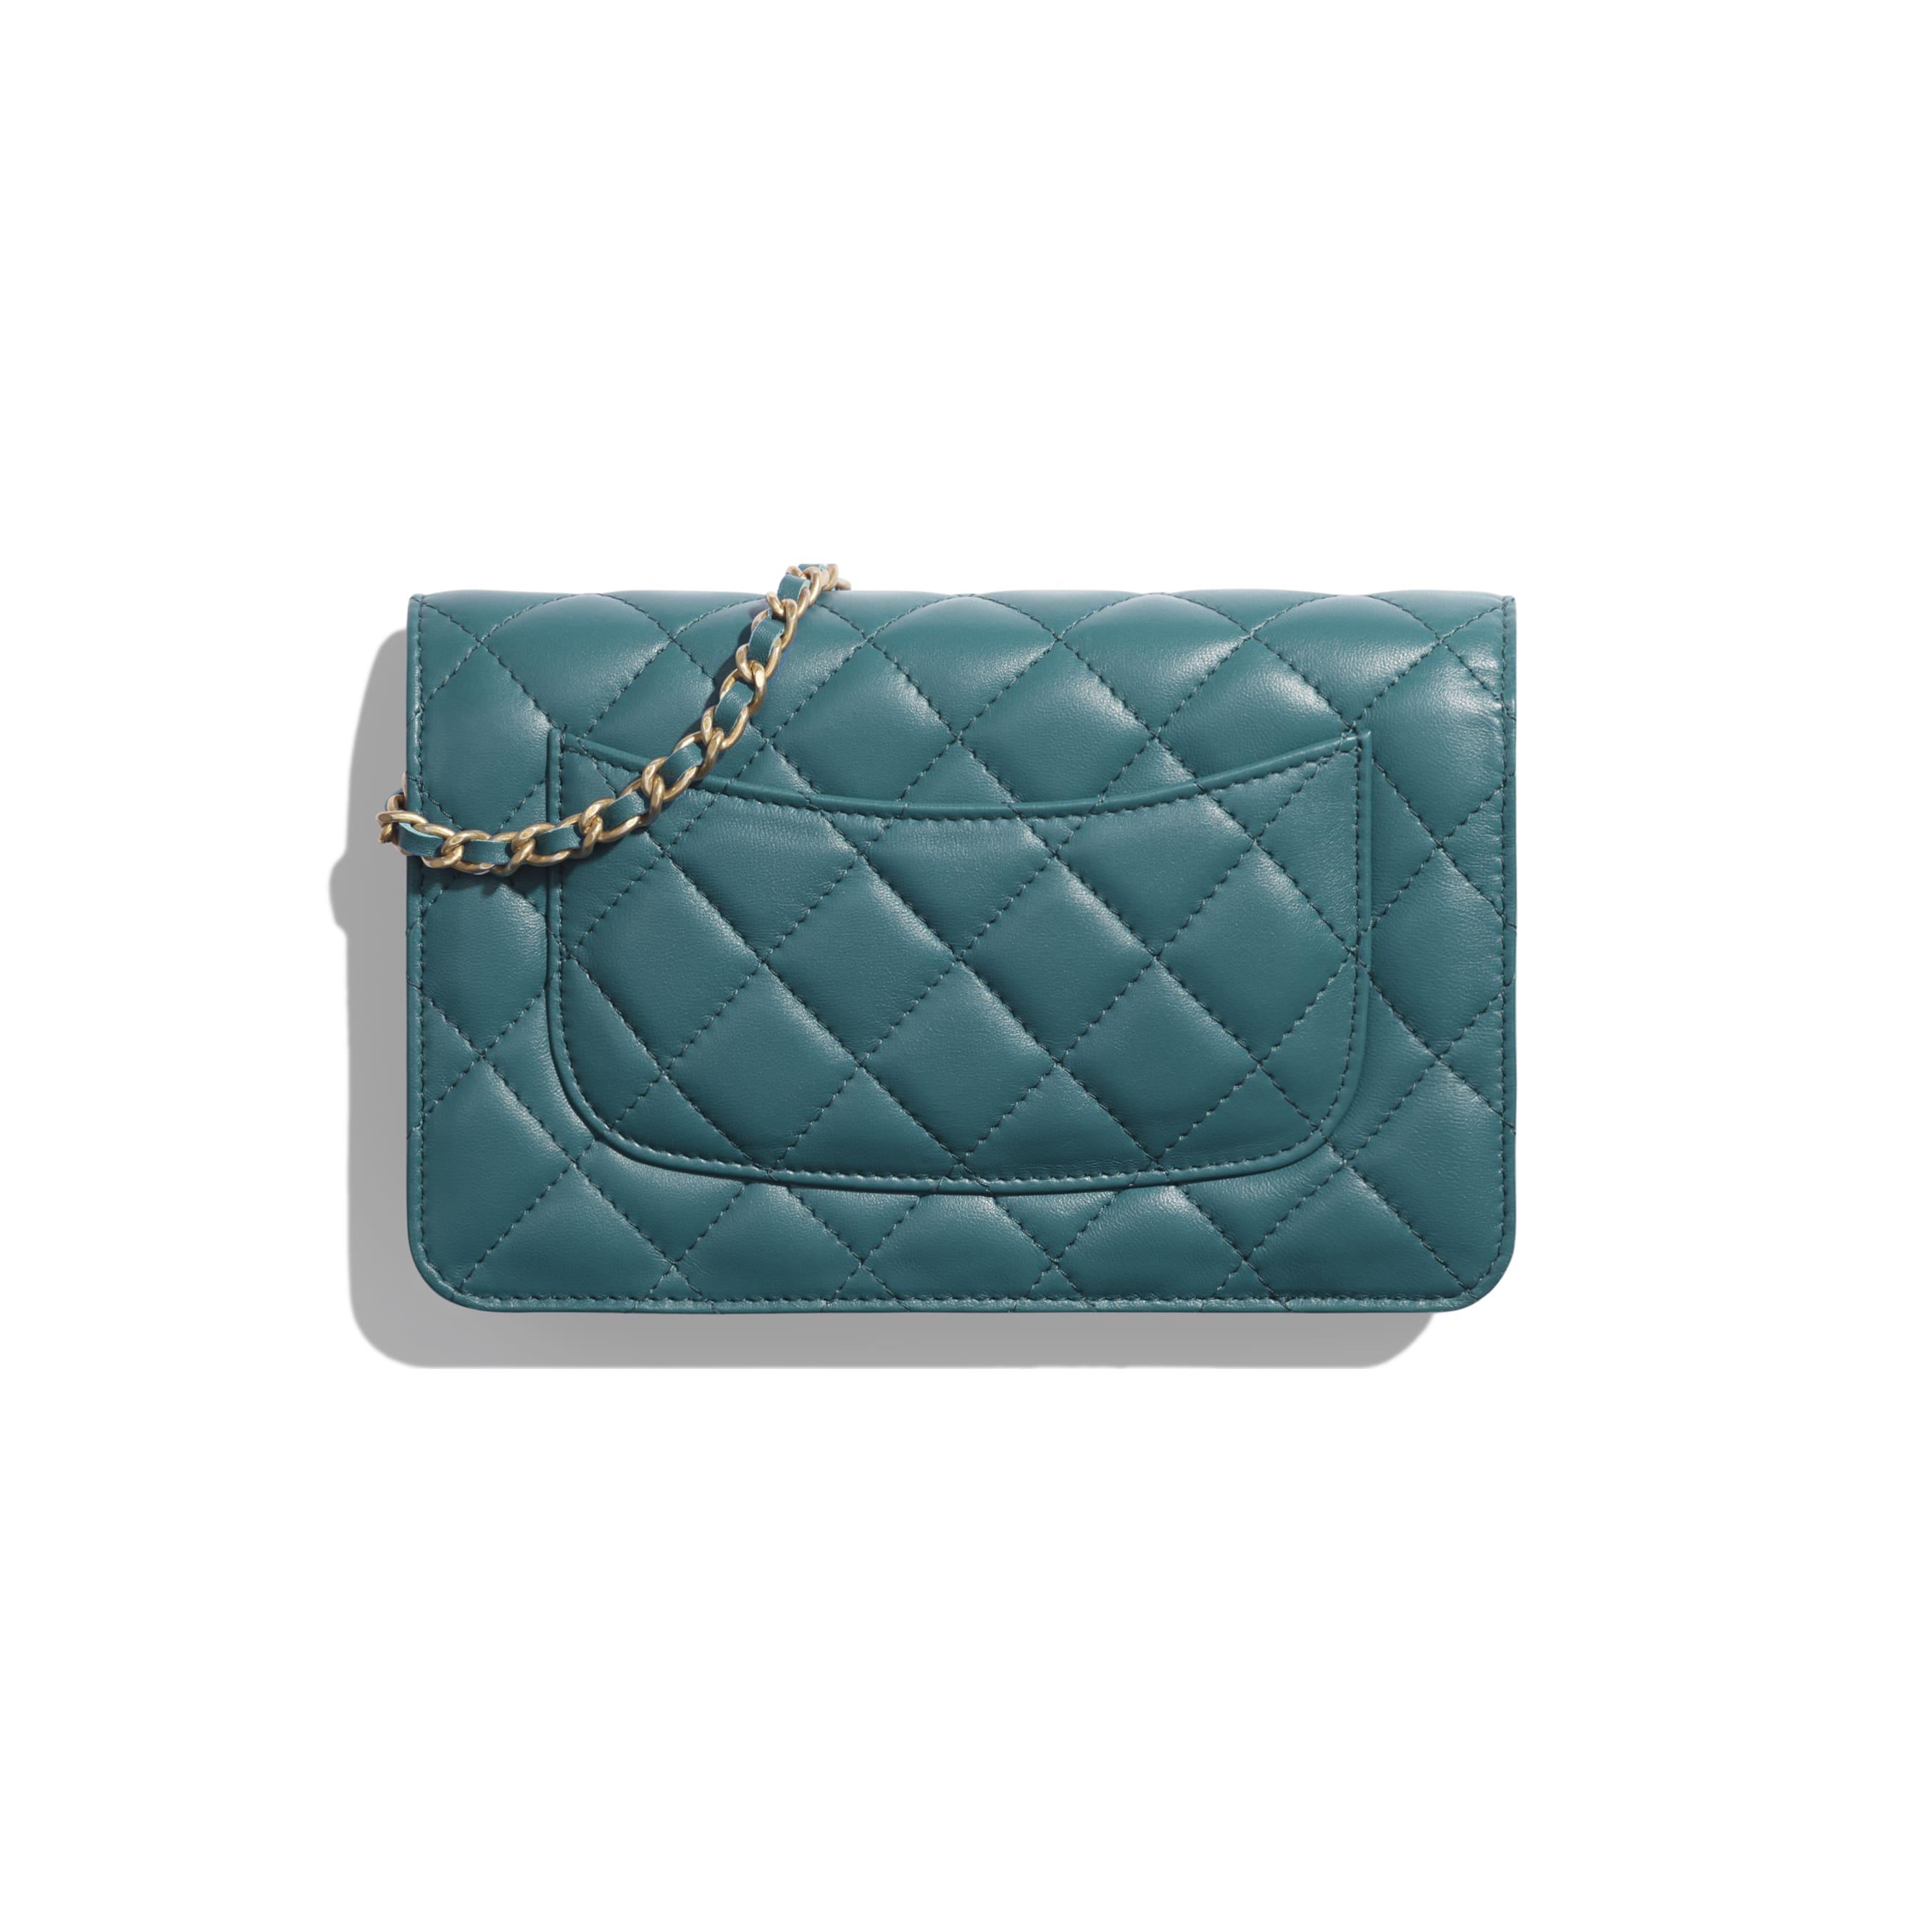 Wallet on Chain - Dark Turquoise - Lambskin & Gold-Tone Metal - Alternative view - see standard sized version